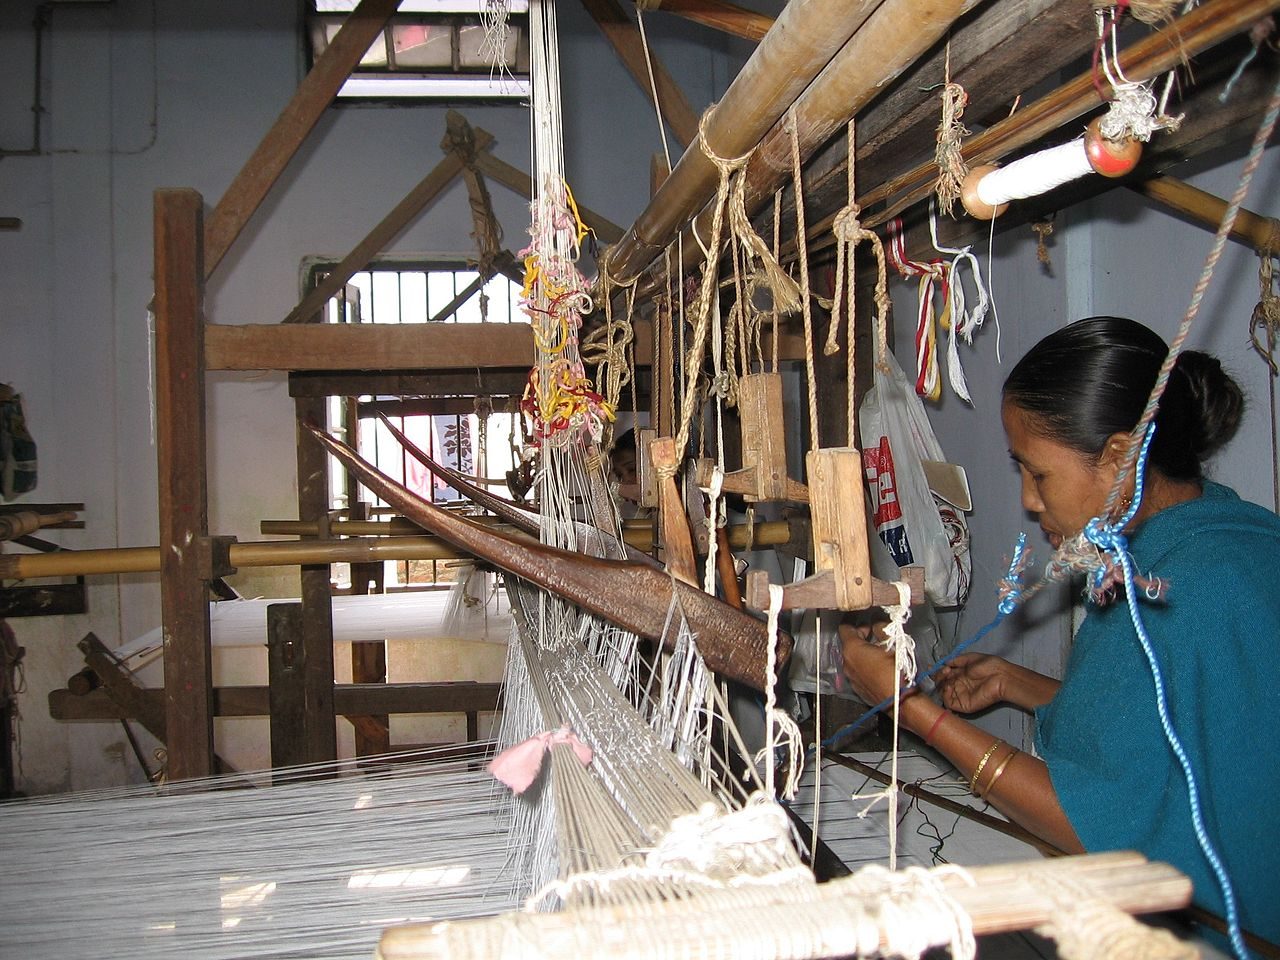 File:Assamese woman using traditional handloom jpg - Wikimedia Commons